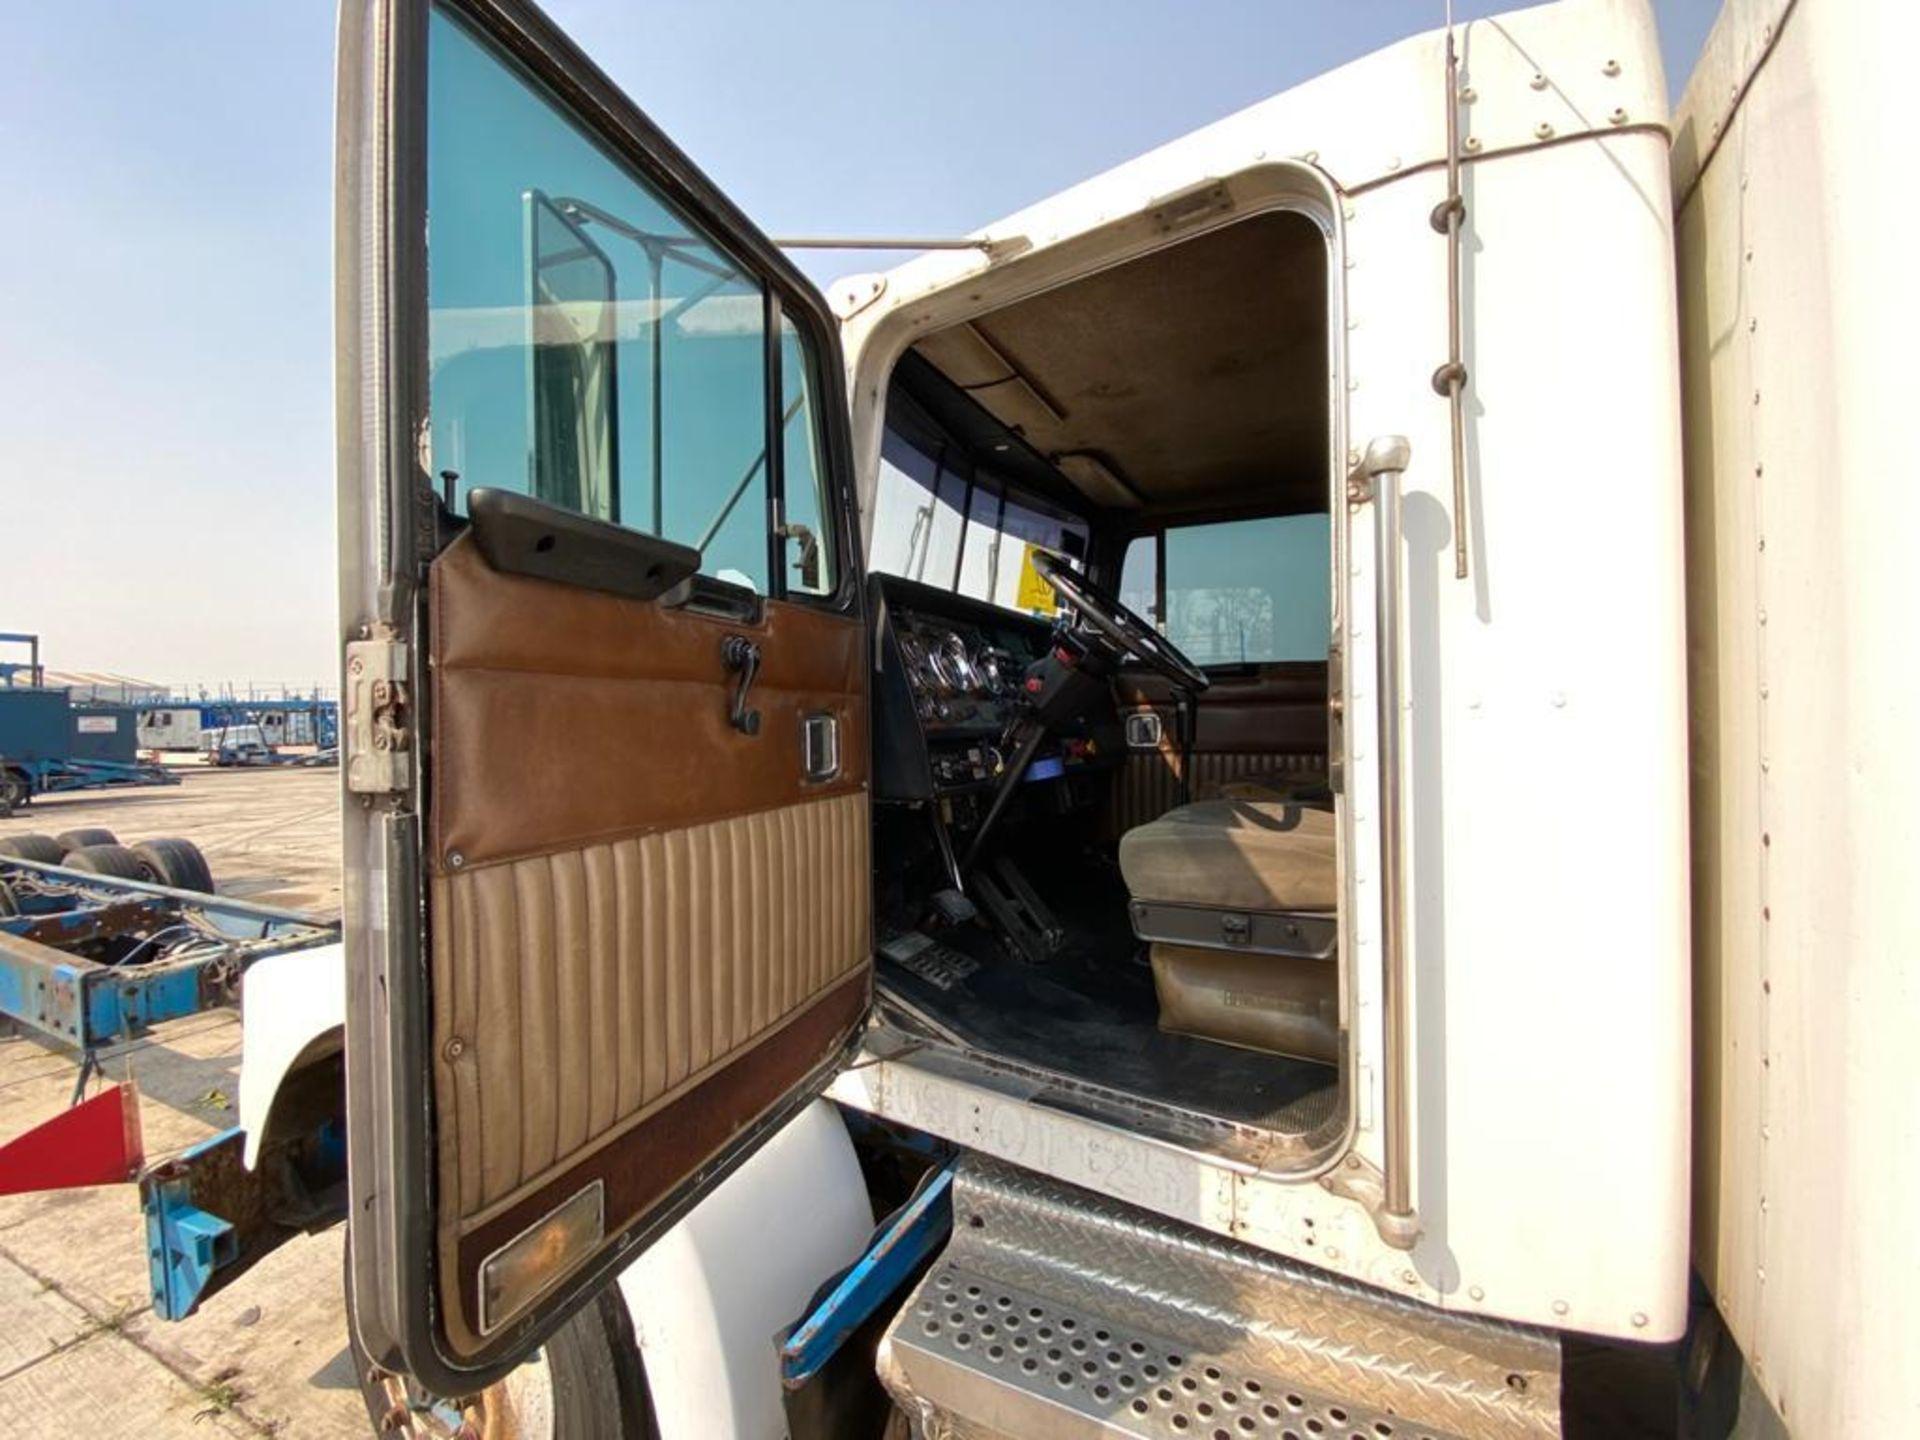 1999 Kenworth Sleeper truck tractor, standard transmission of 18 speeds - Image 55 of 75